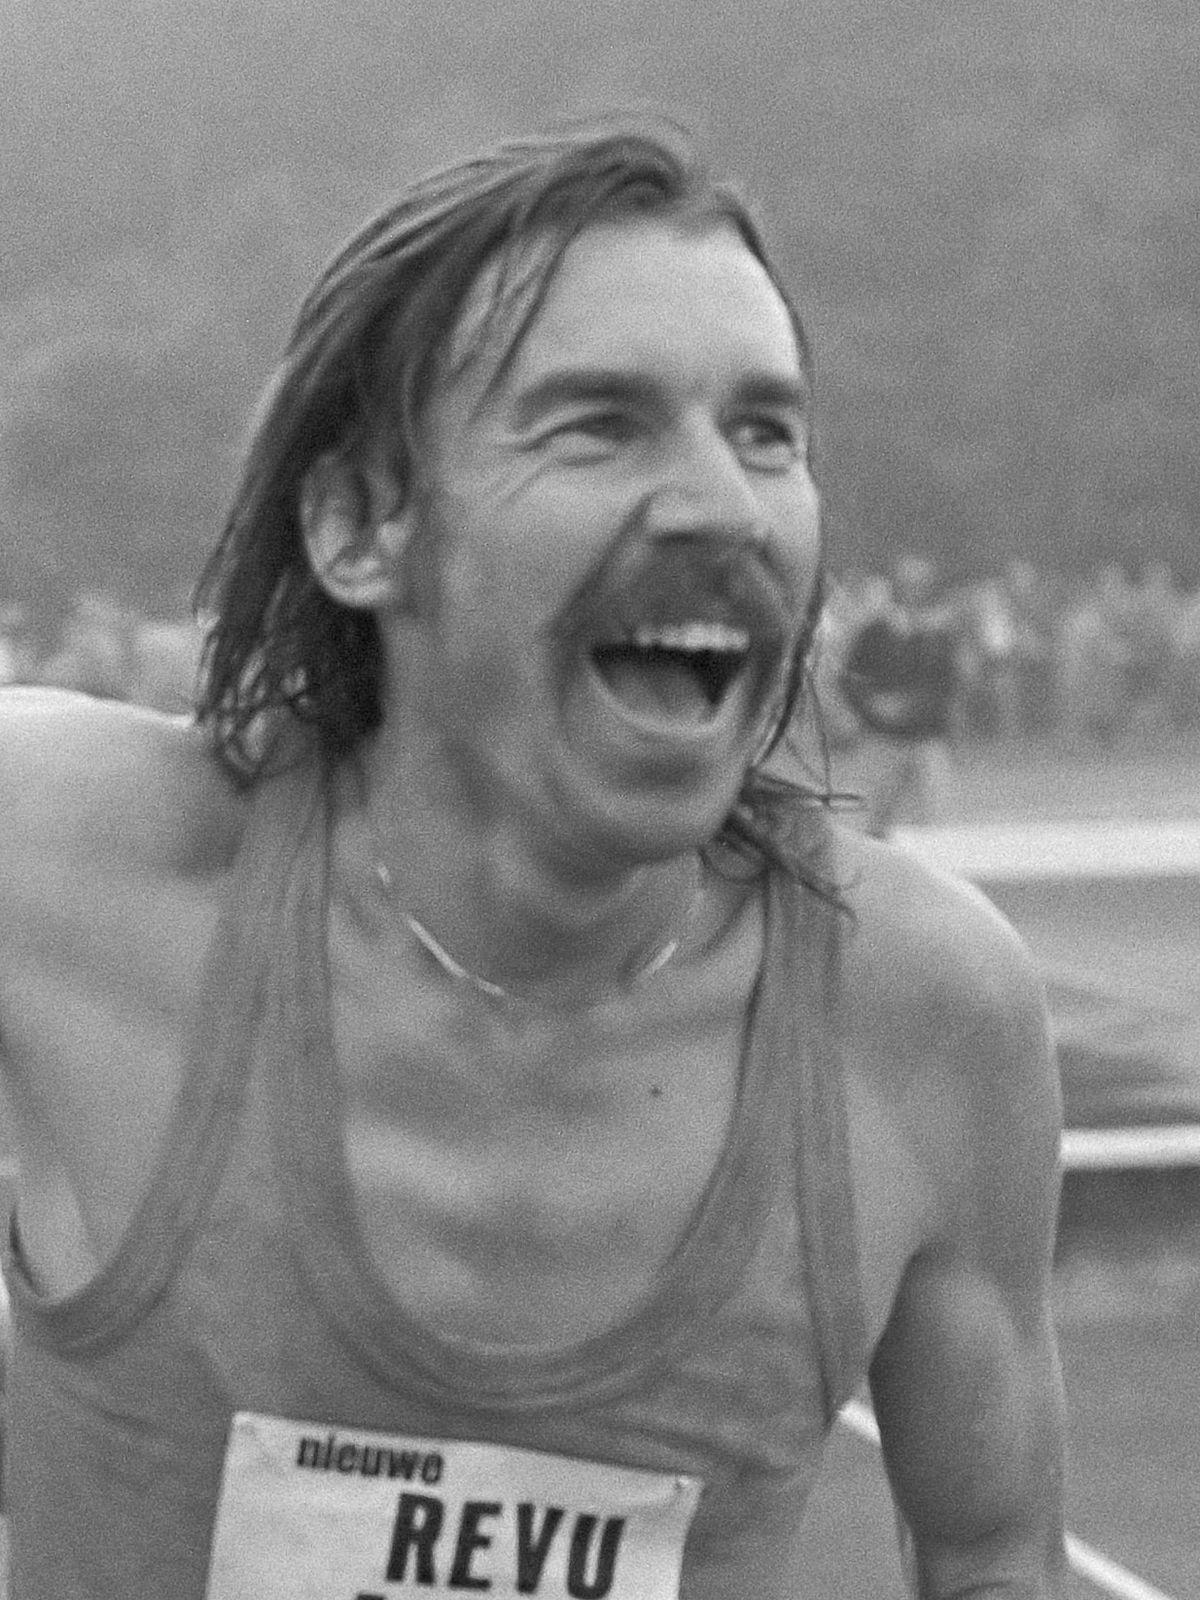 IMG DICK QUAX, Theodorus Jacobus Leonardus, New Zealand Runner